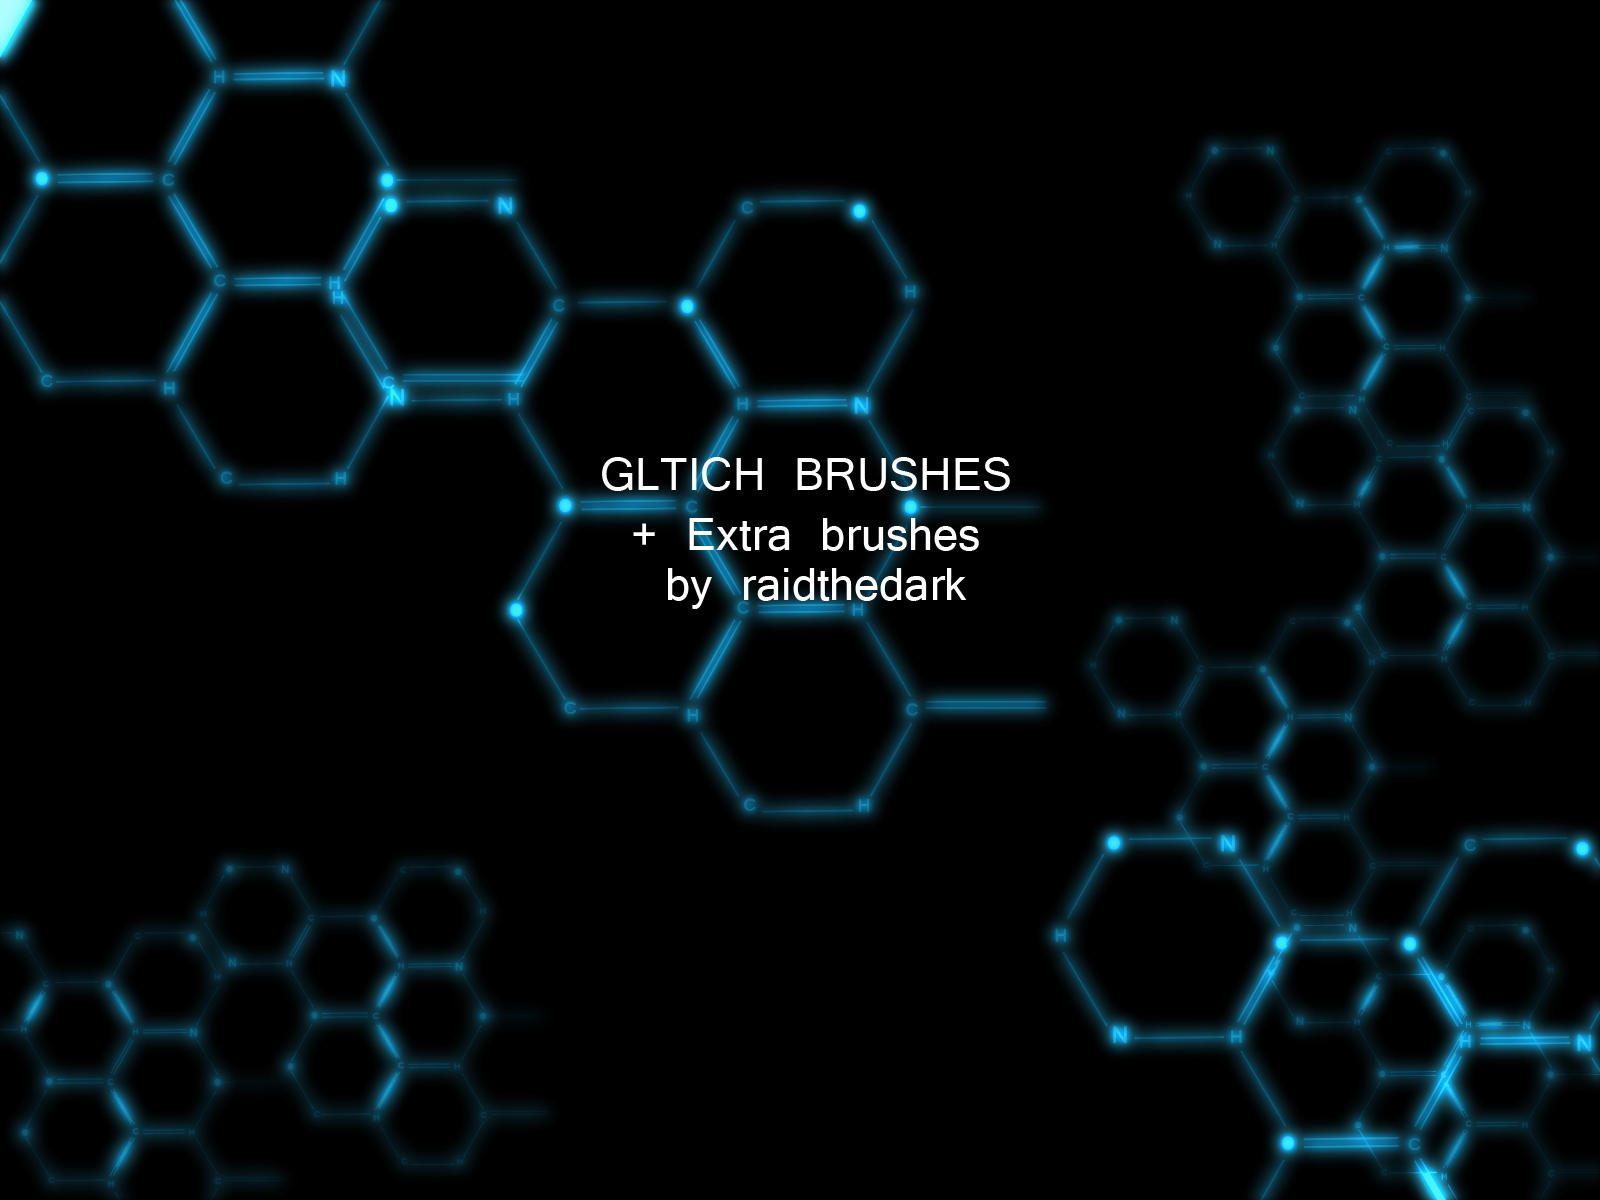 Glitch Brushes and stuff by Raidthedark